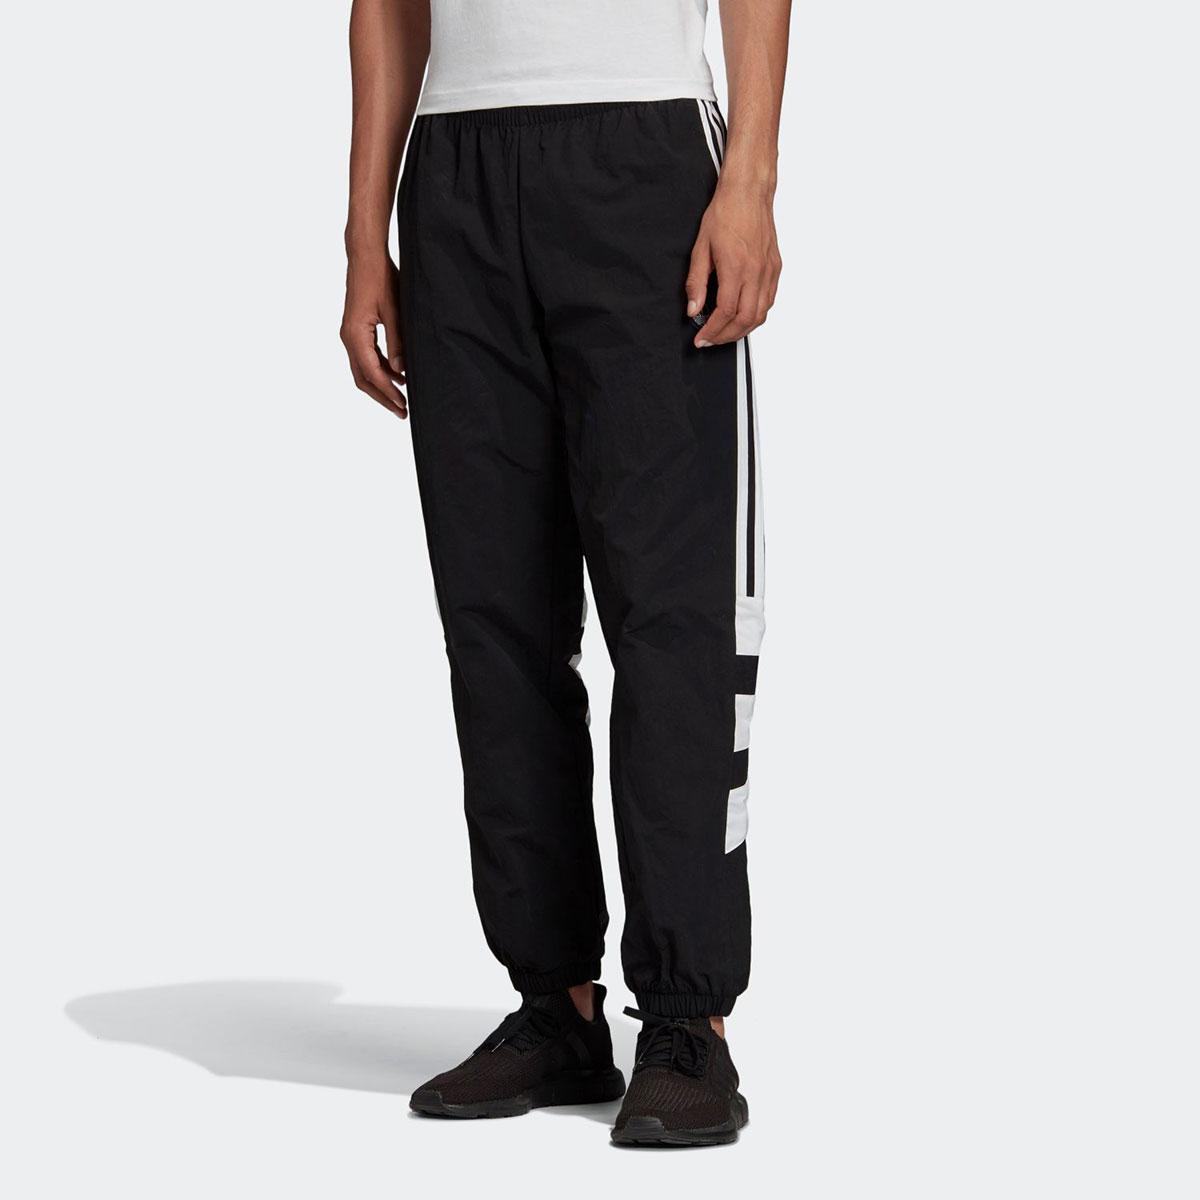 adidas BALANTA TRACK PANTS(BLACK)(アディダス バランタ トラック パンツ)【メンズ】【パンツ】【19FW-I】